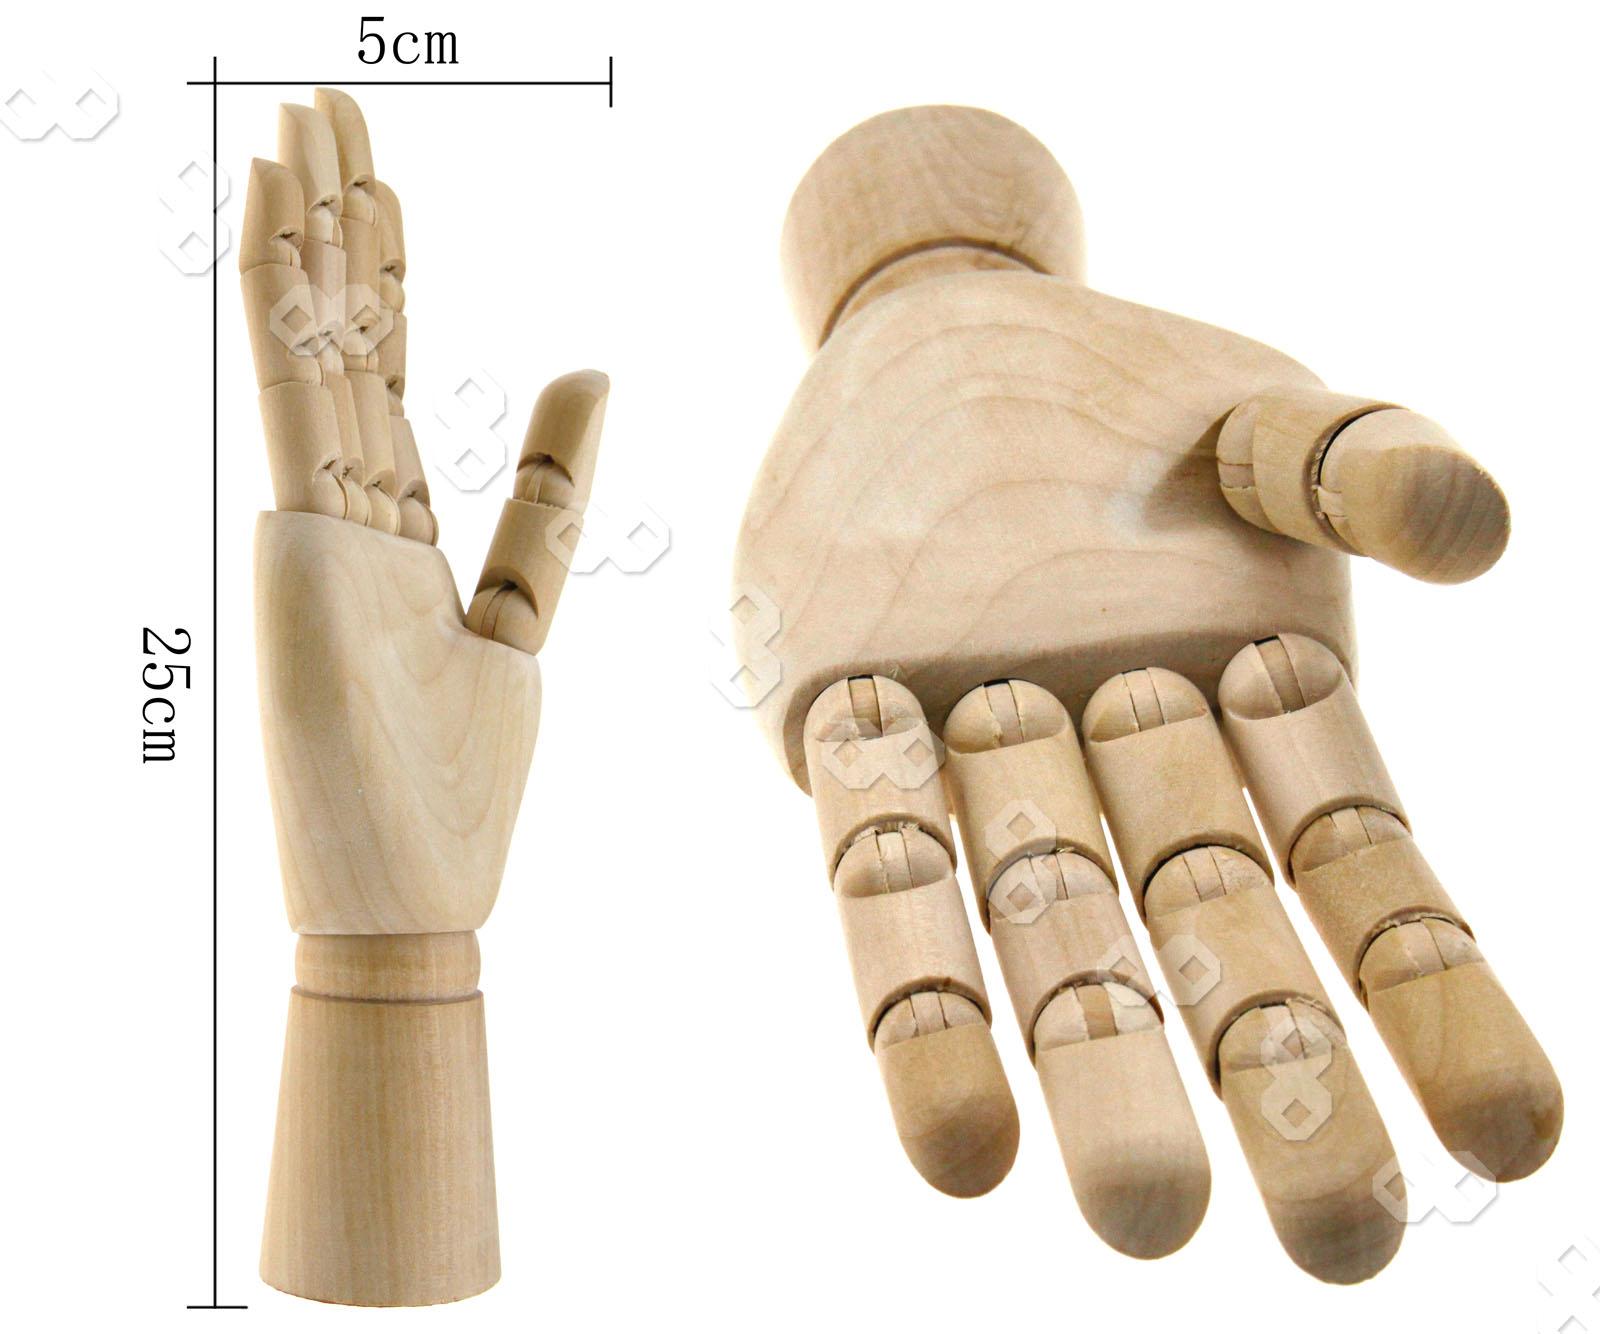 1er Modellpuppe Modellhand Holzpuppe Holz H/ände Fingern Modell 25cm